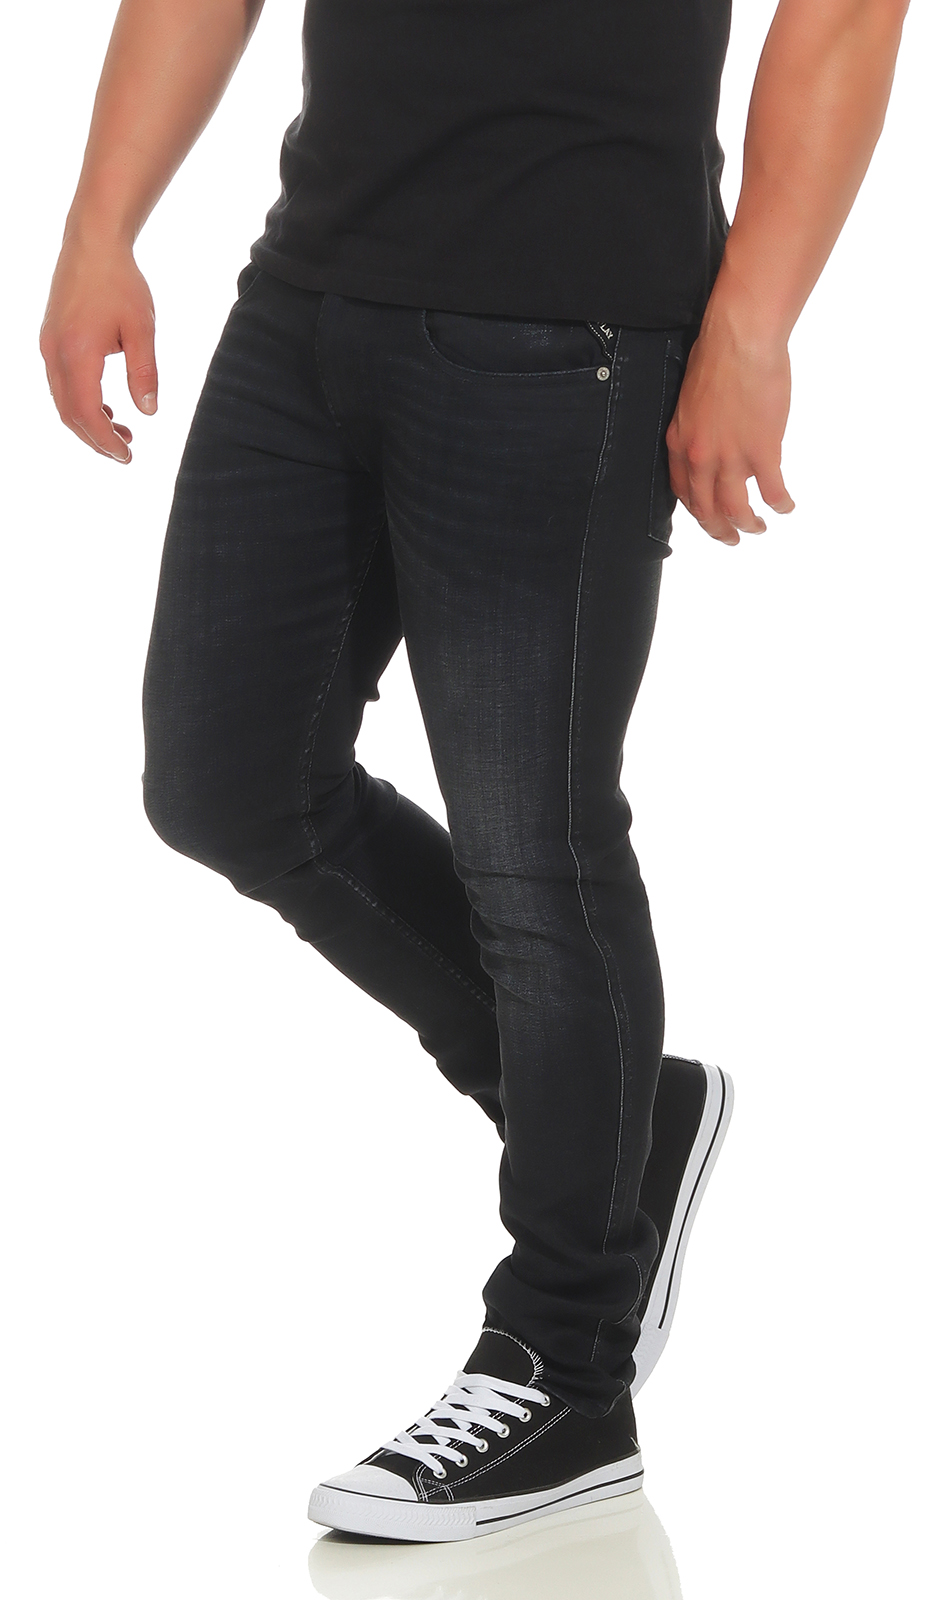 Stretch 000 Replay Slim Fit M914 Herrren 135 tubo Jeans Denim 385 Anbass qx4wRZx1